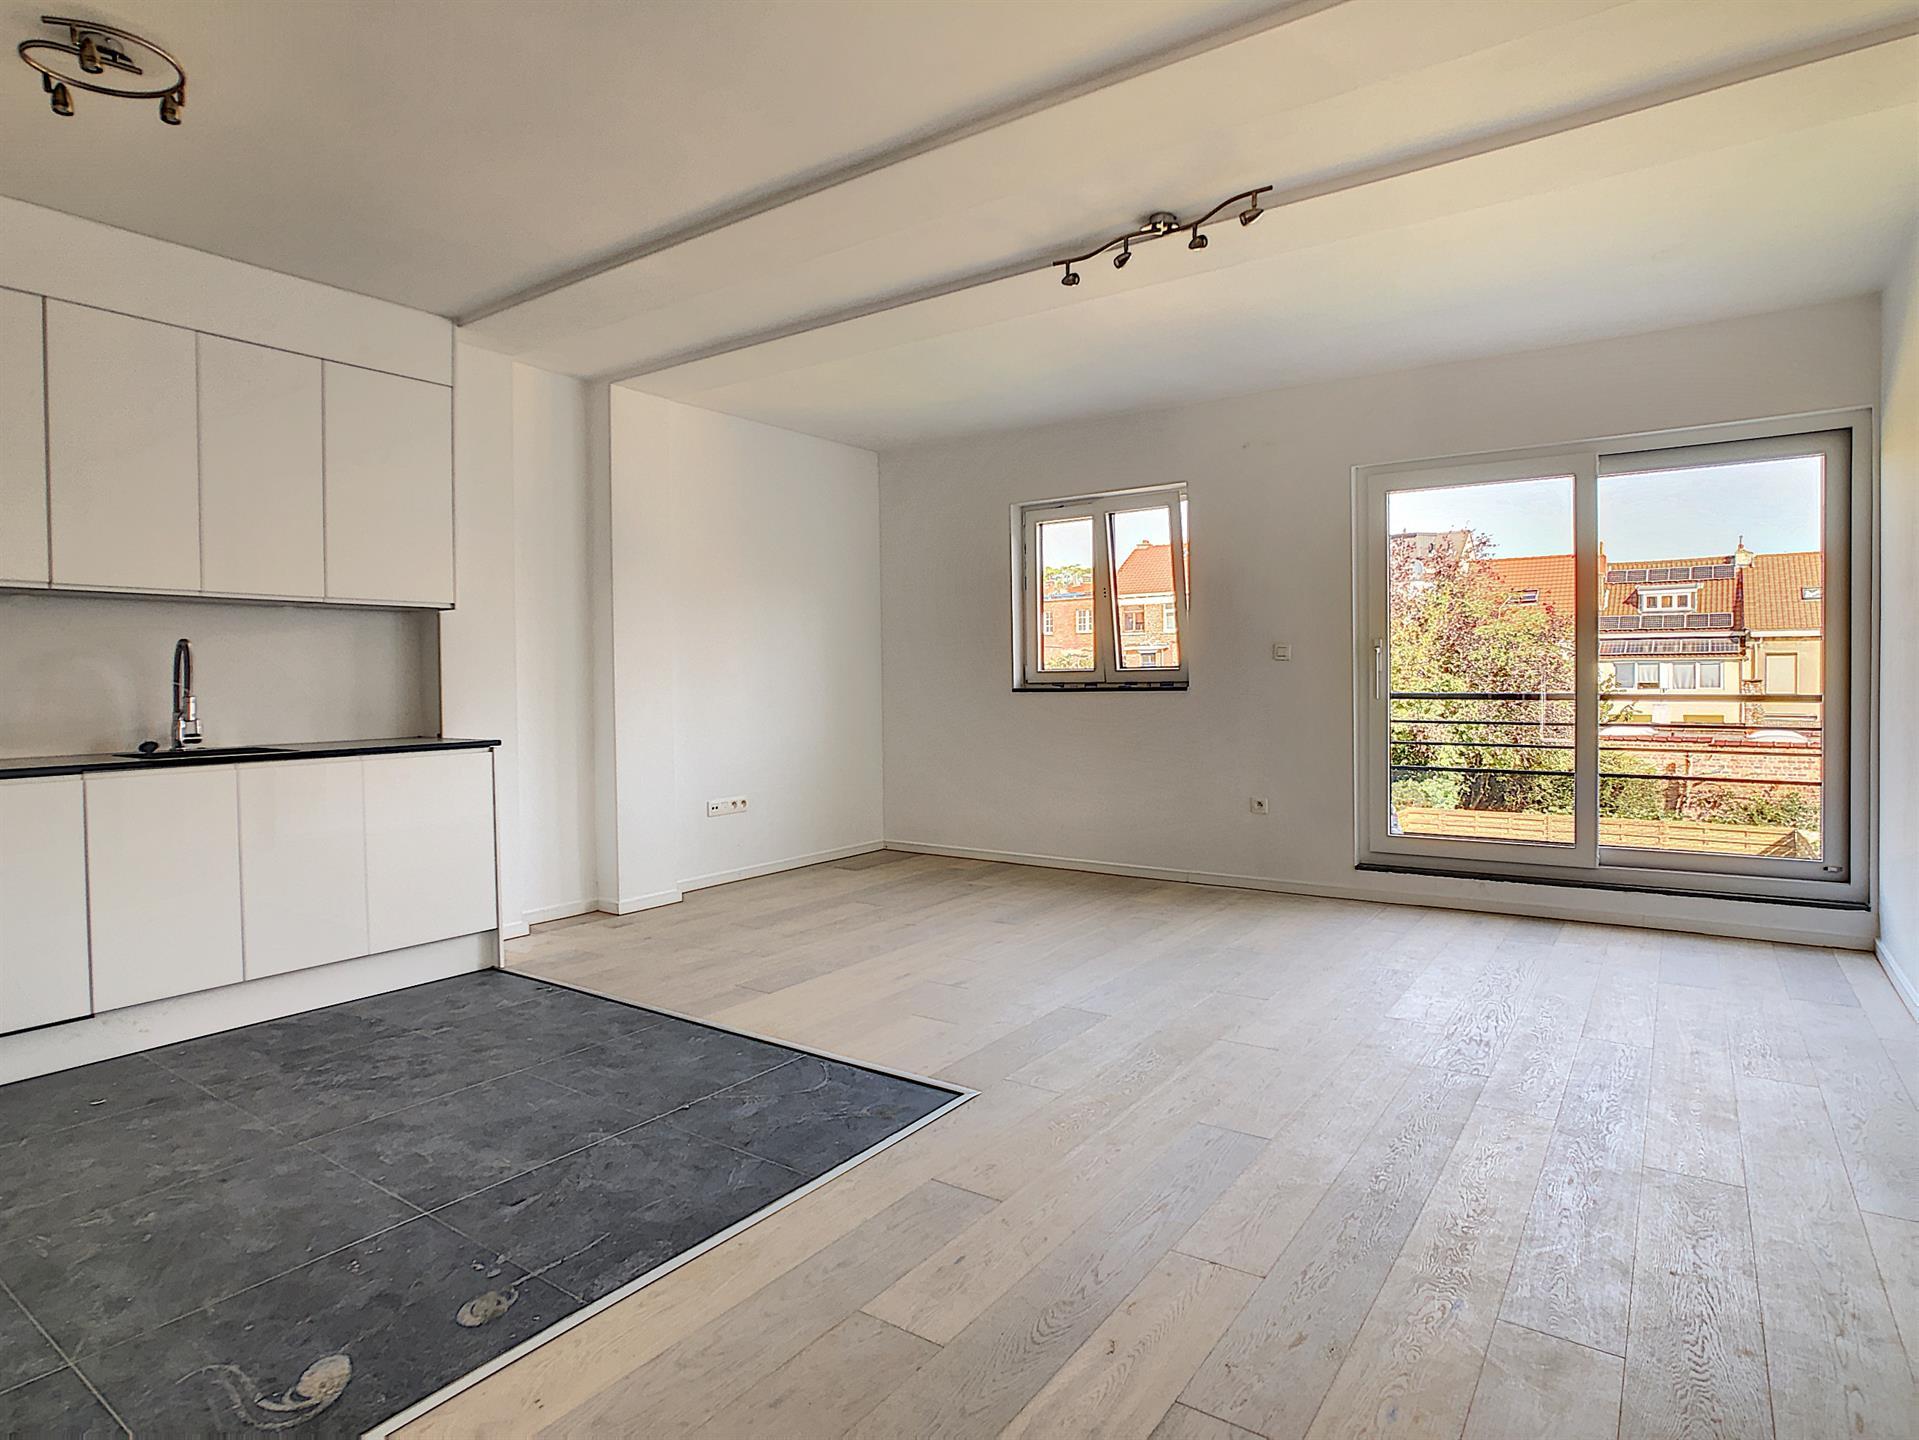 Appartement - Anderlecht - #4252388-13